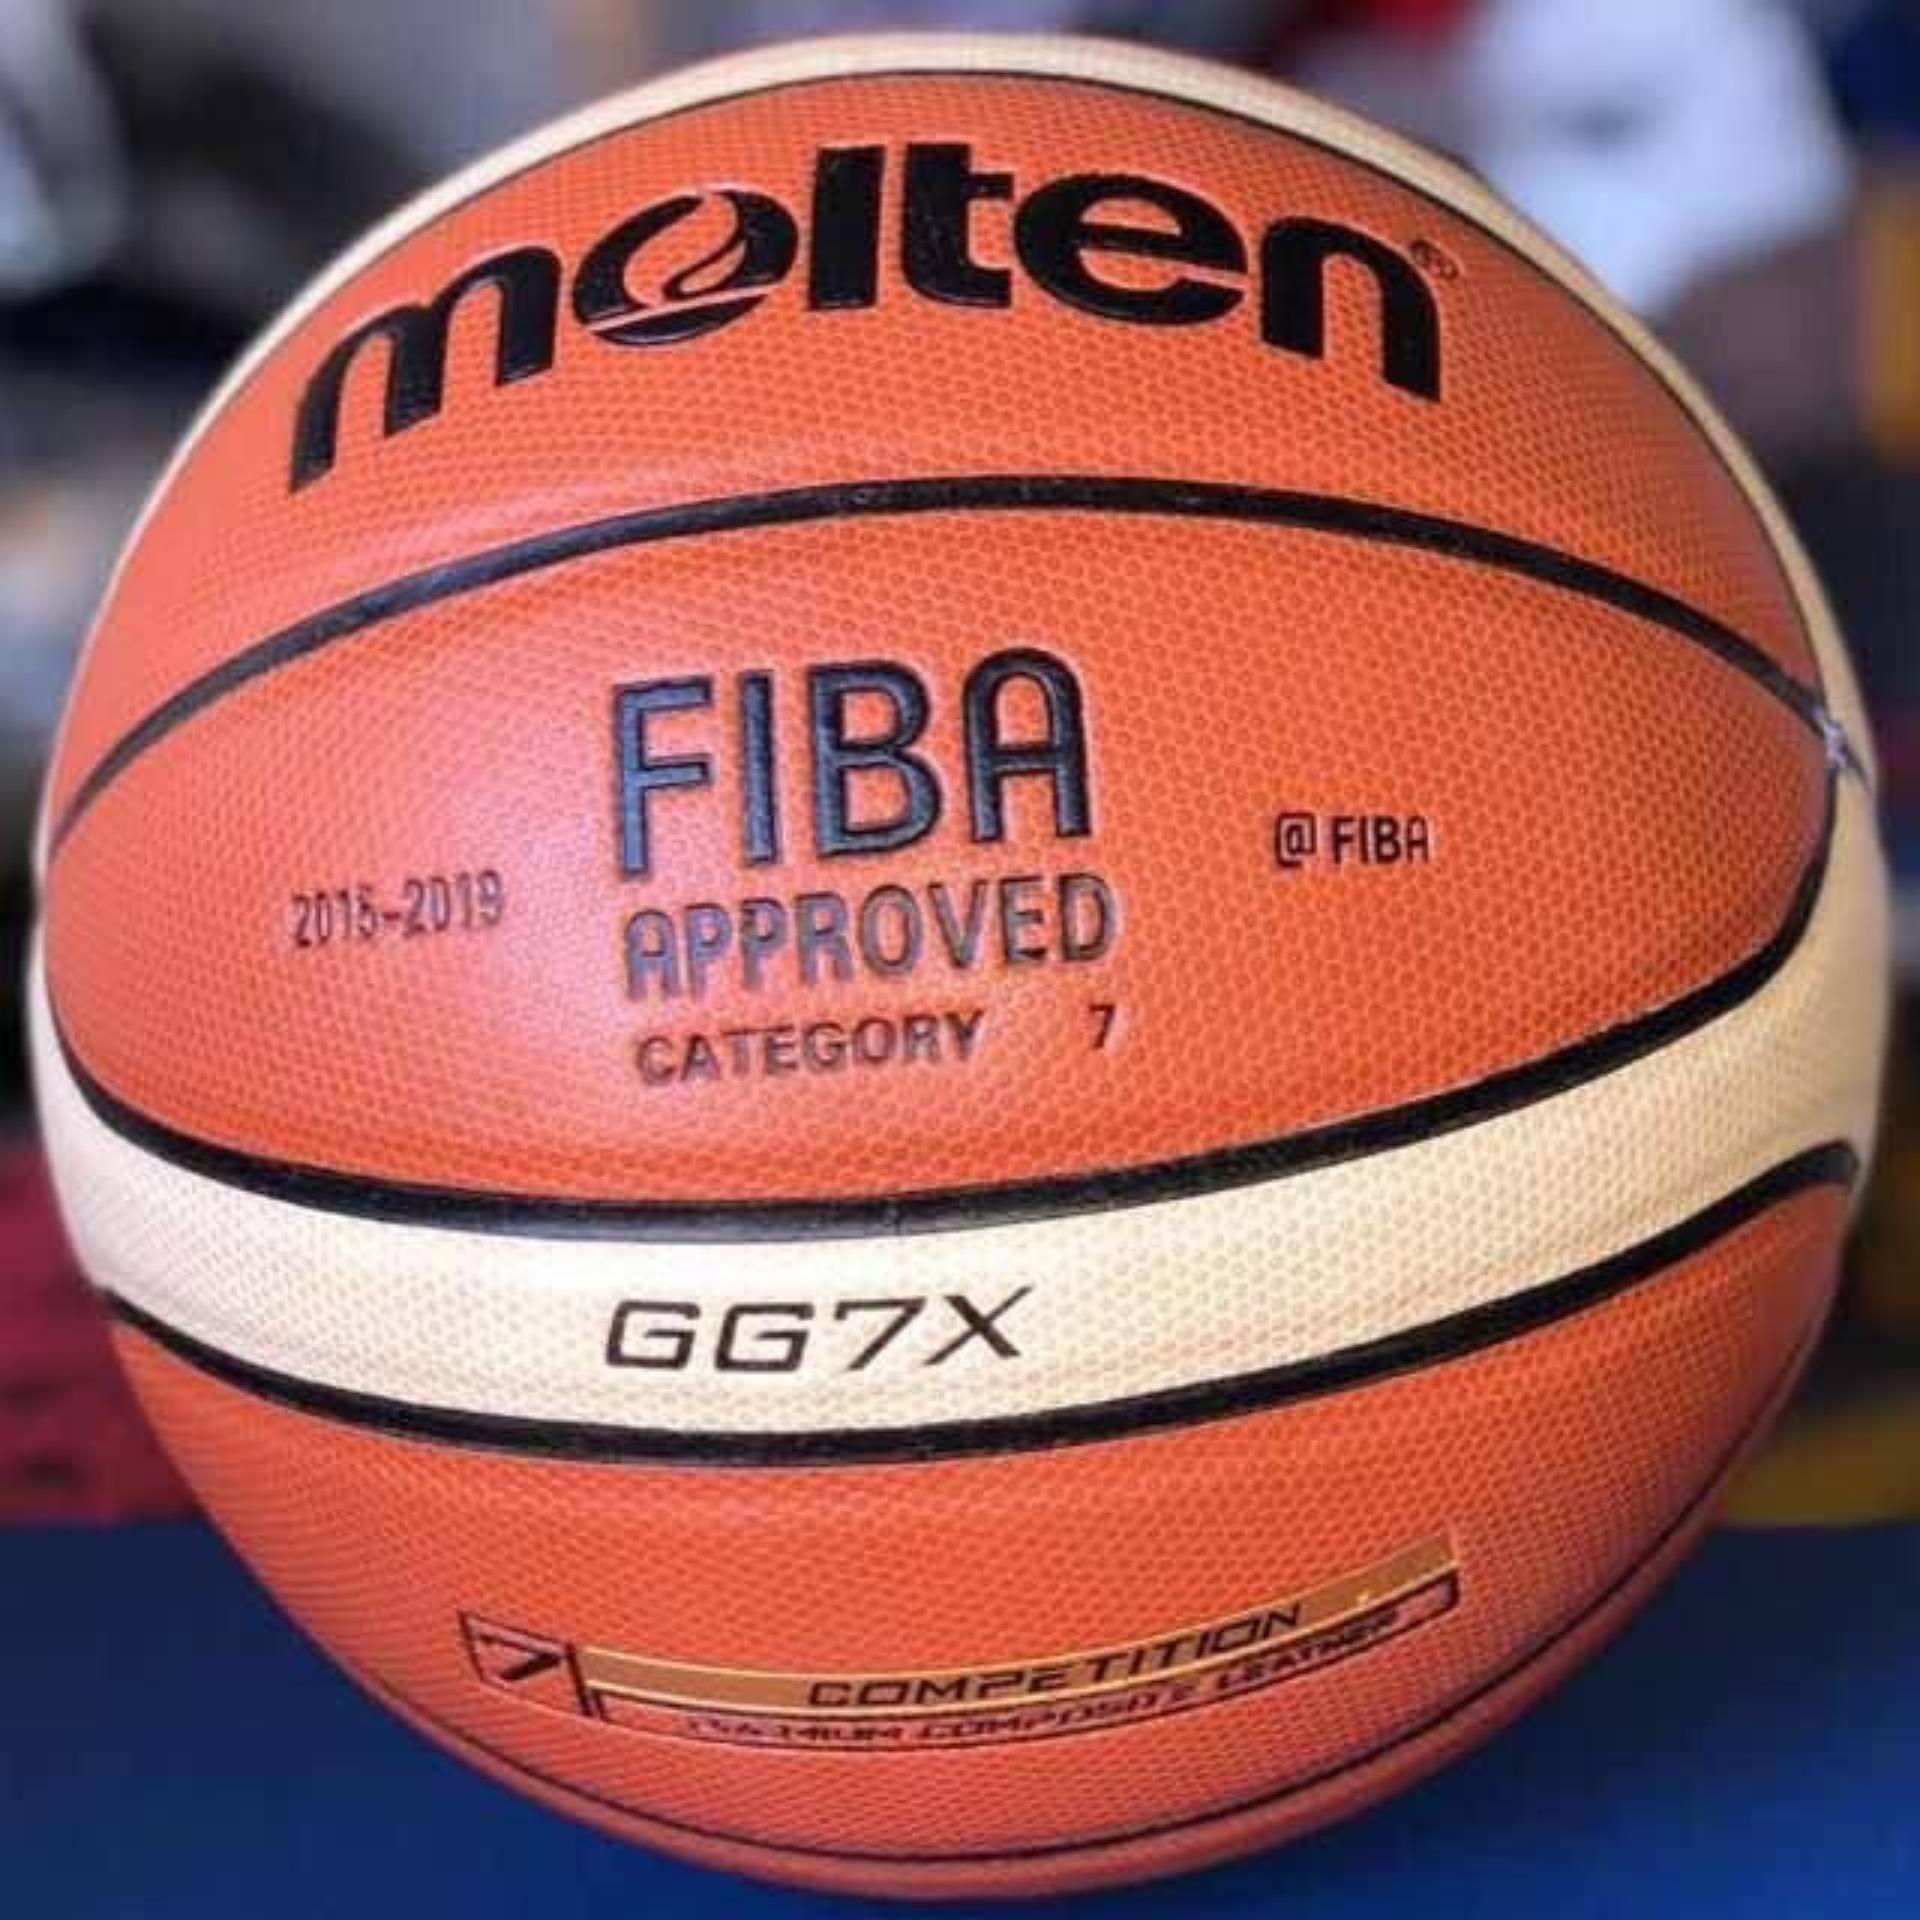 Basketball for sale - Basketball Game online brands ...